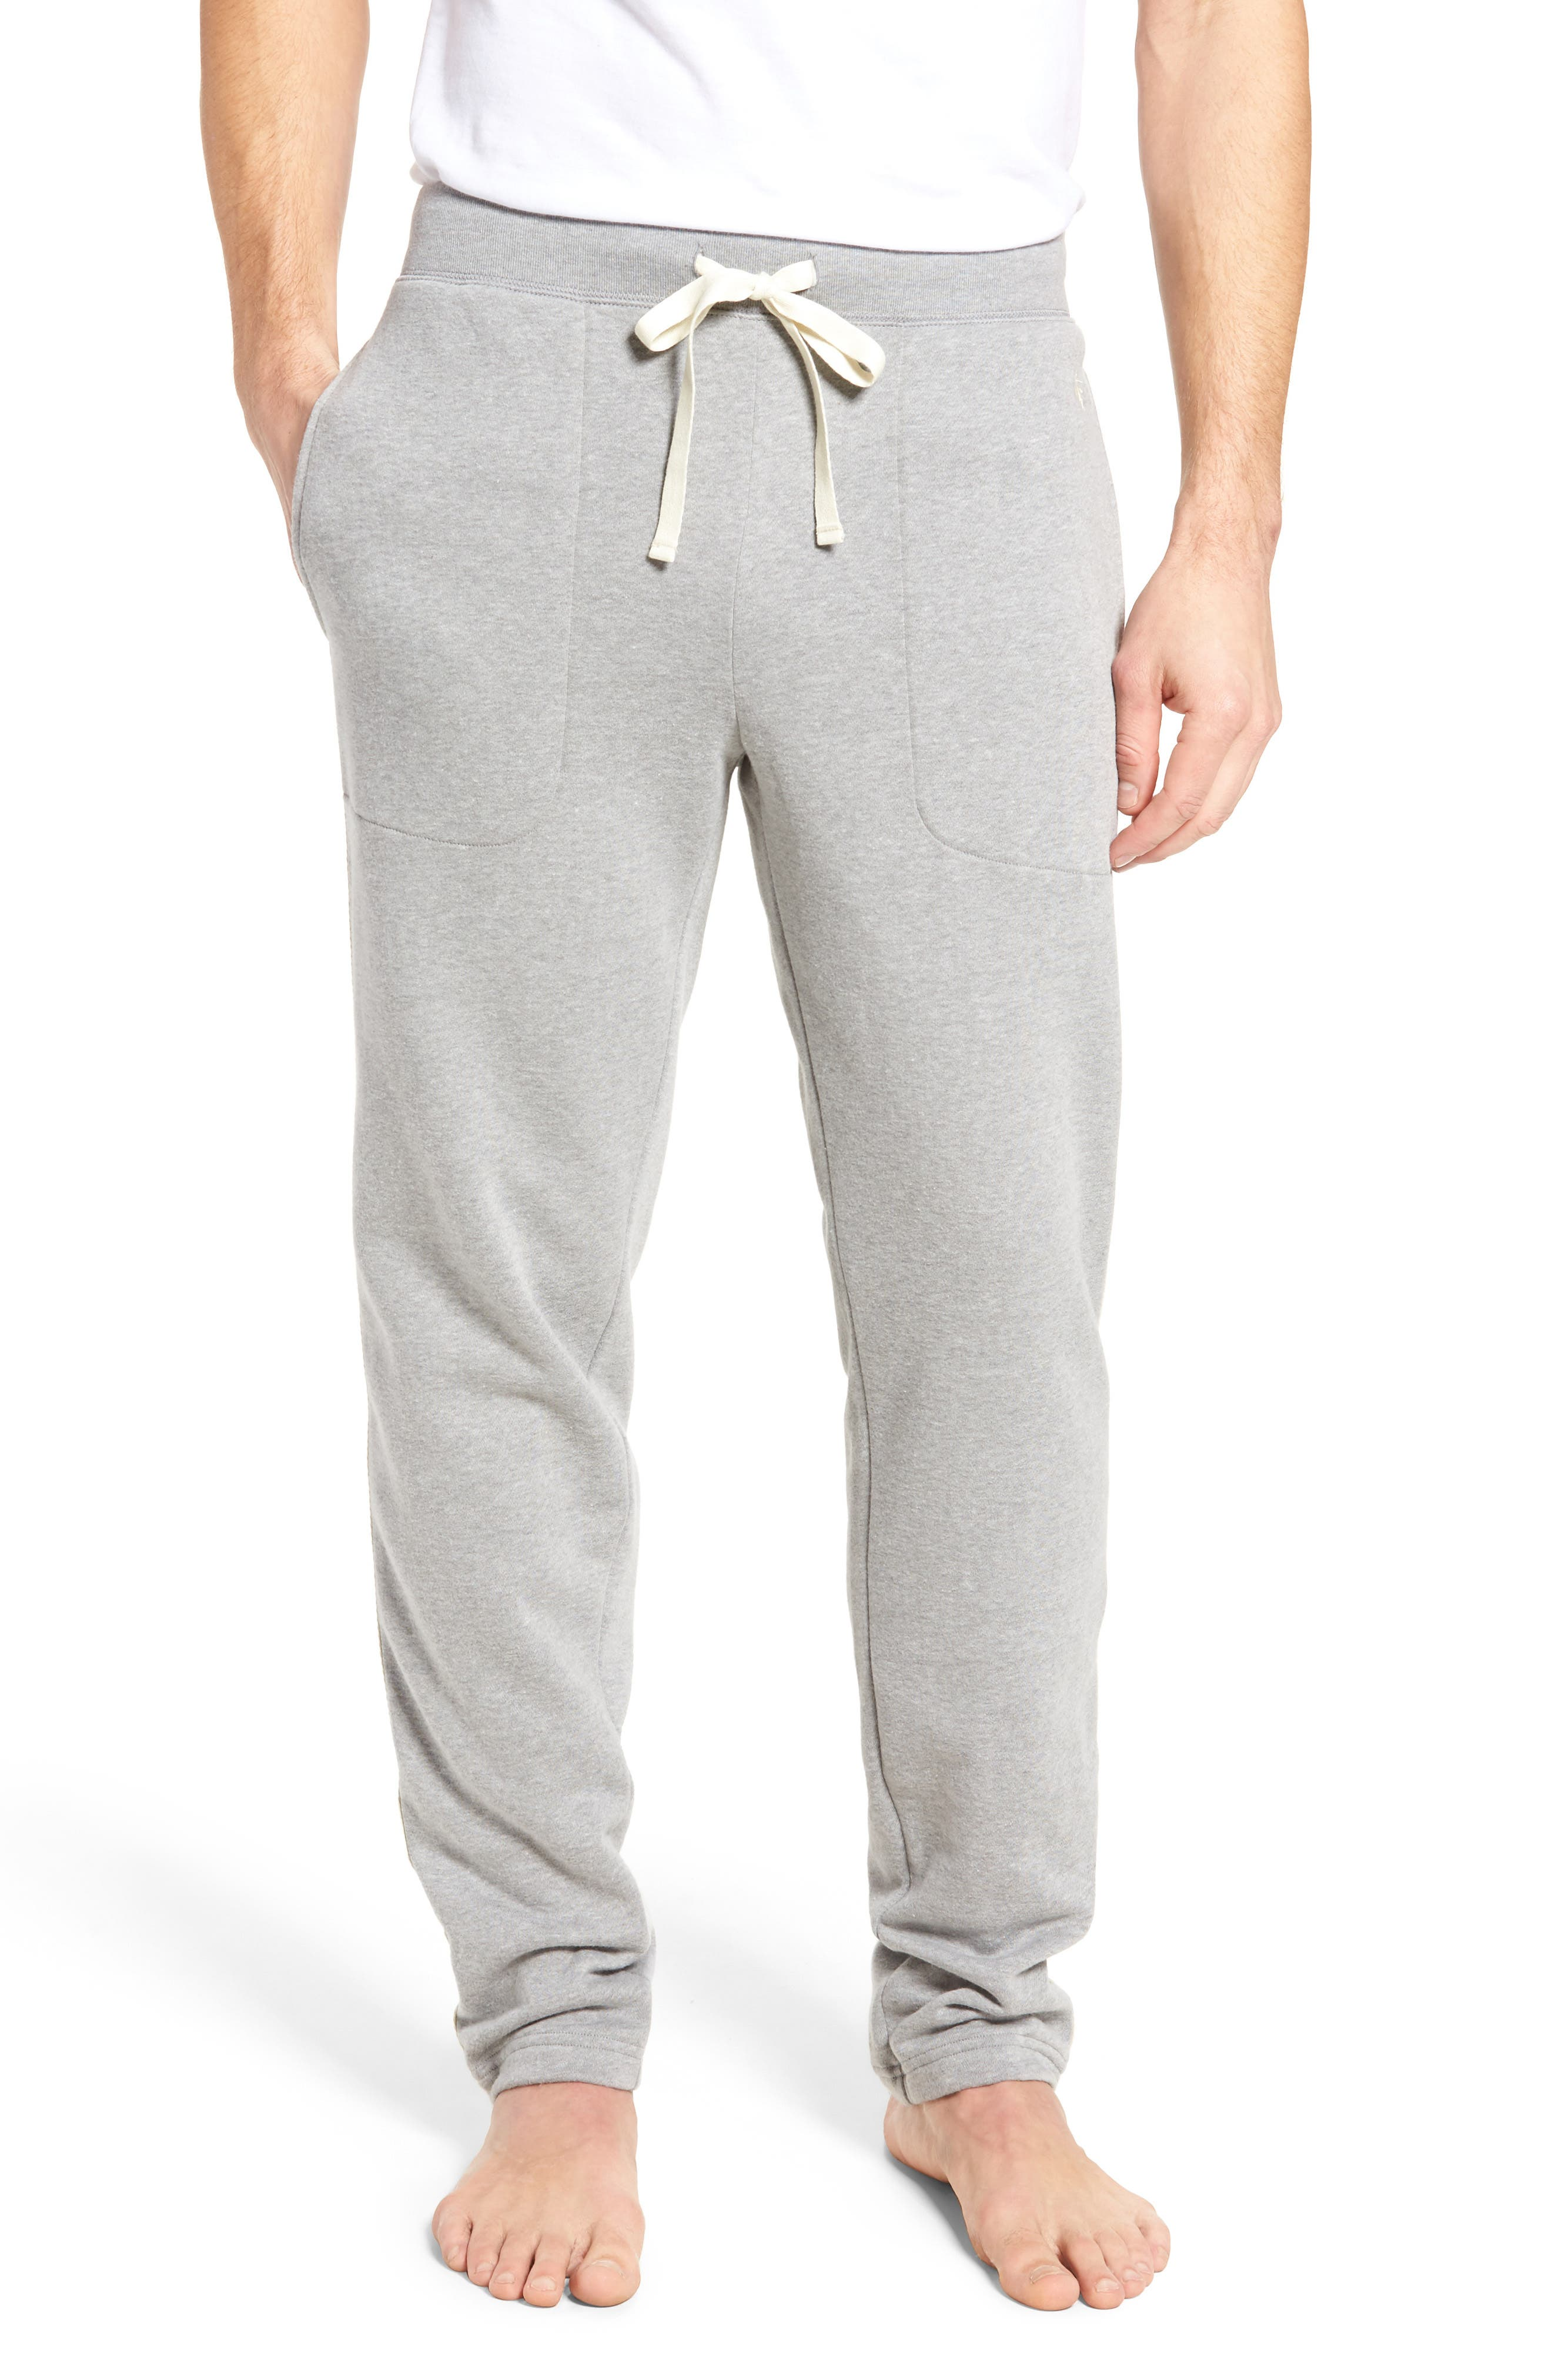 Slim Fit Brushed Fleece Pajama Pants,                             Main thumbnail 1, color,                             Andover Heather/ Cream